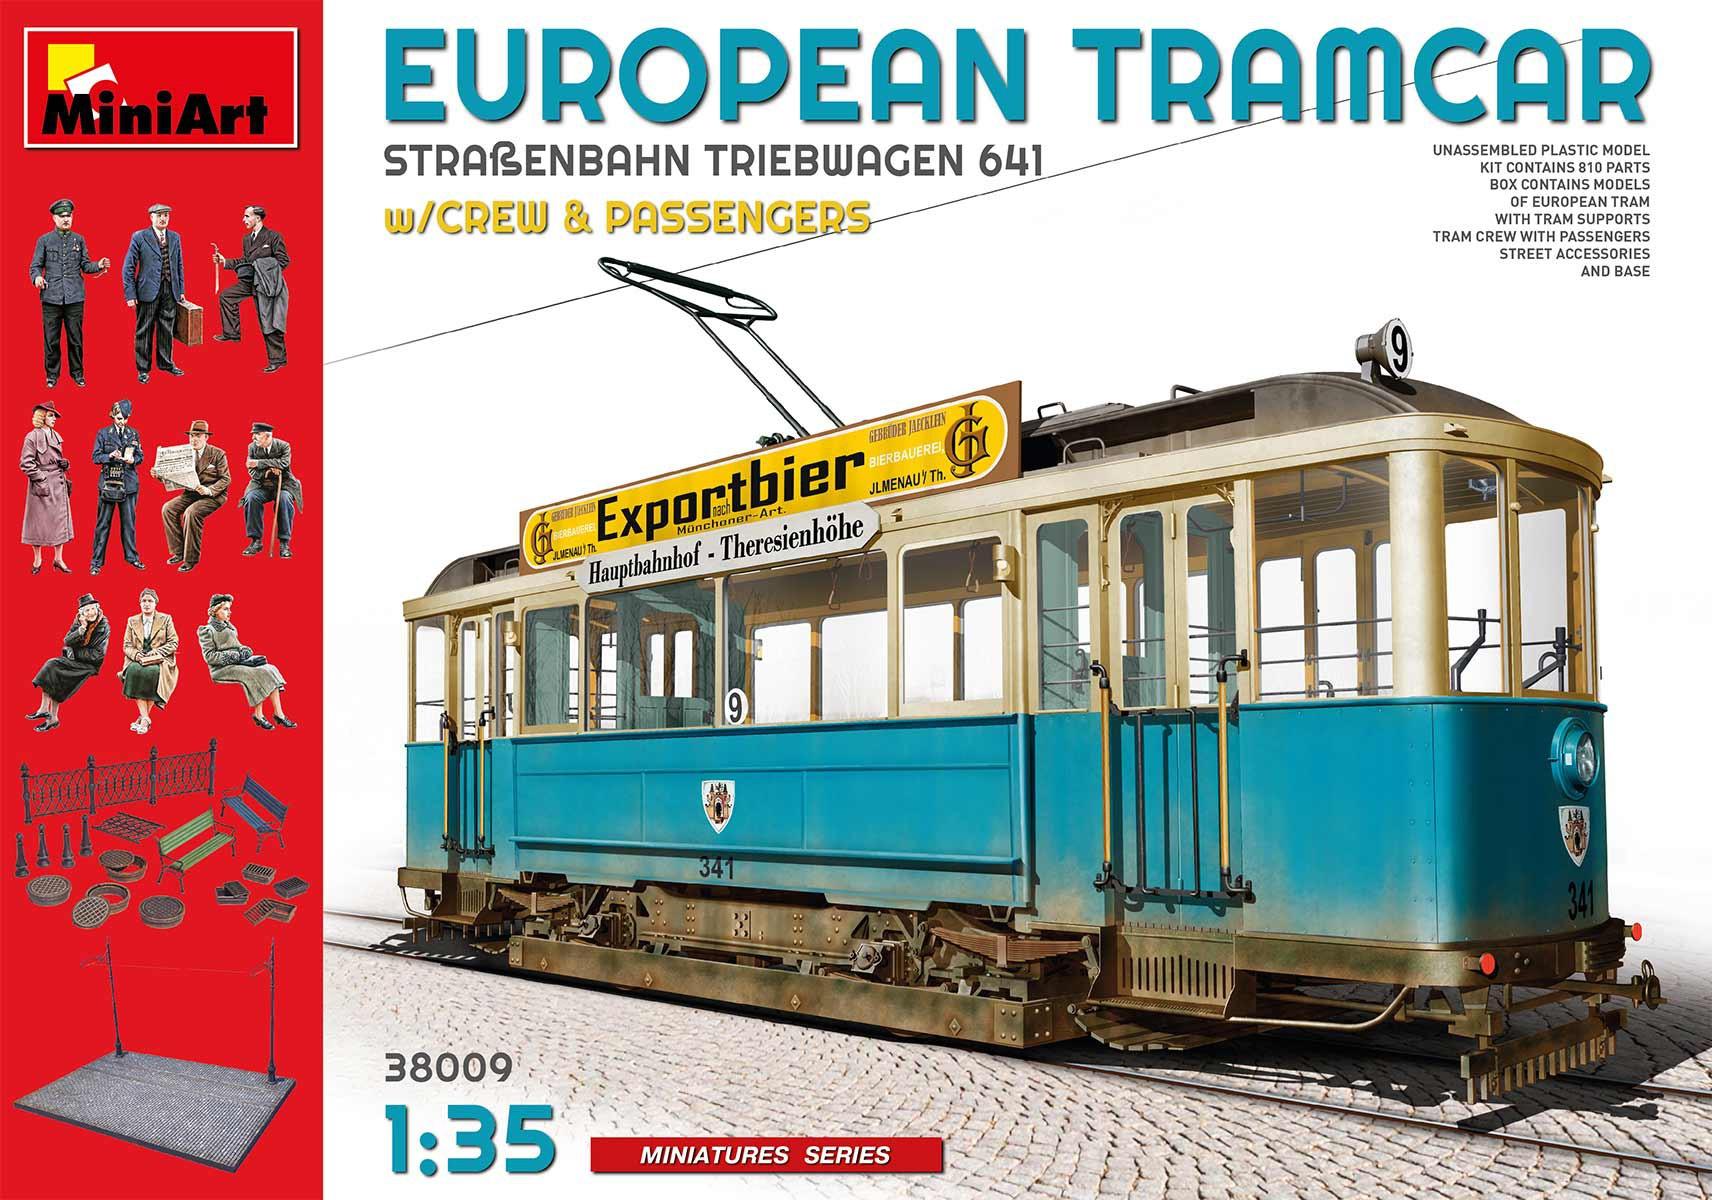 MiniArt European Tramcar Strassenbahn